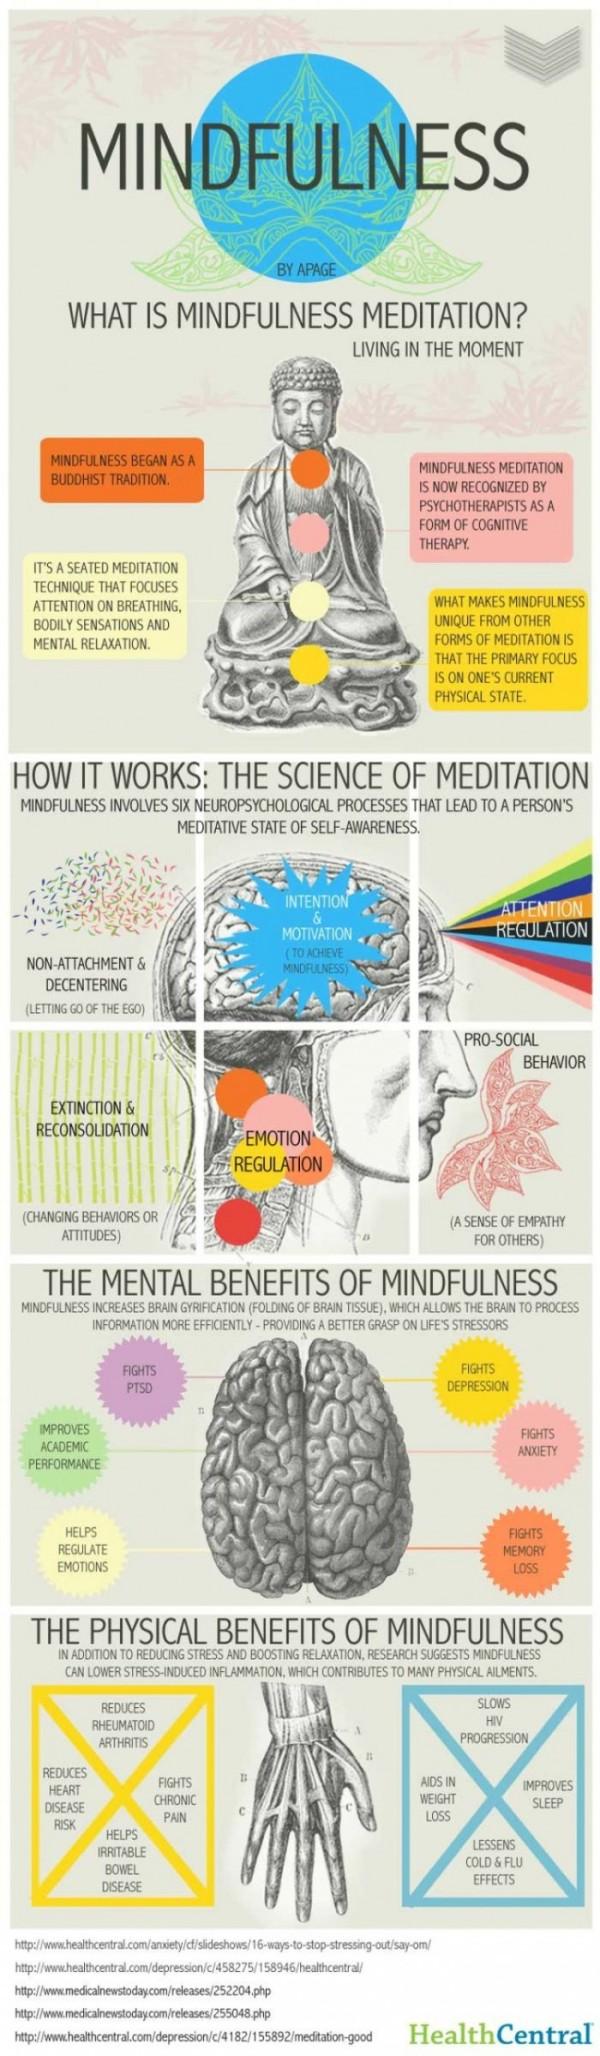 midnfulness